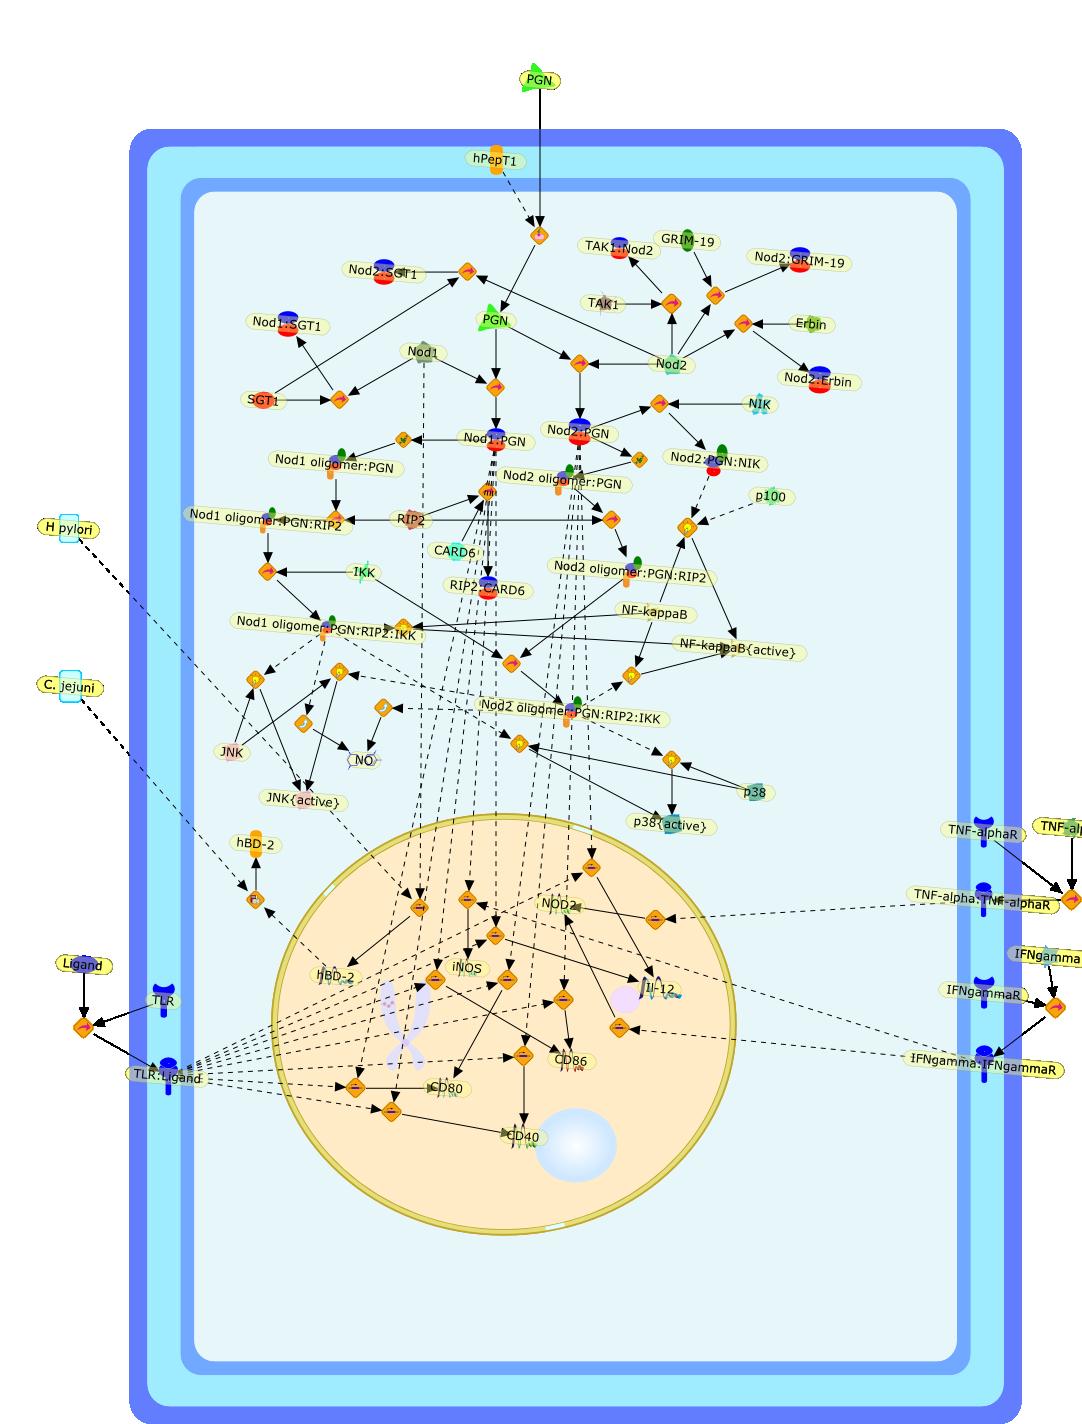 pathway image